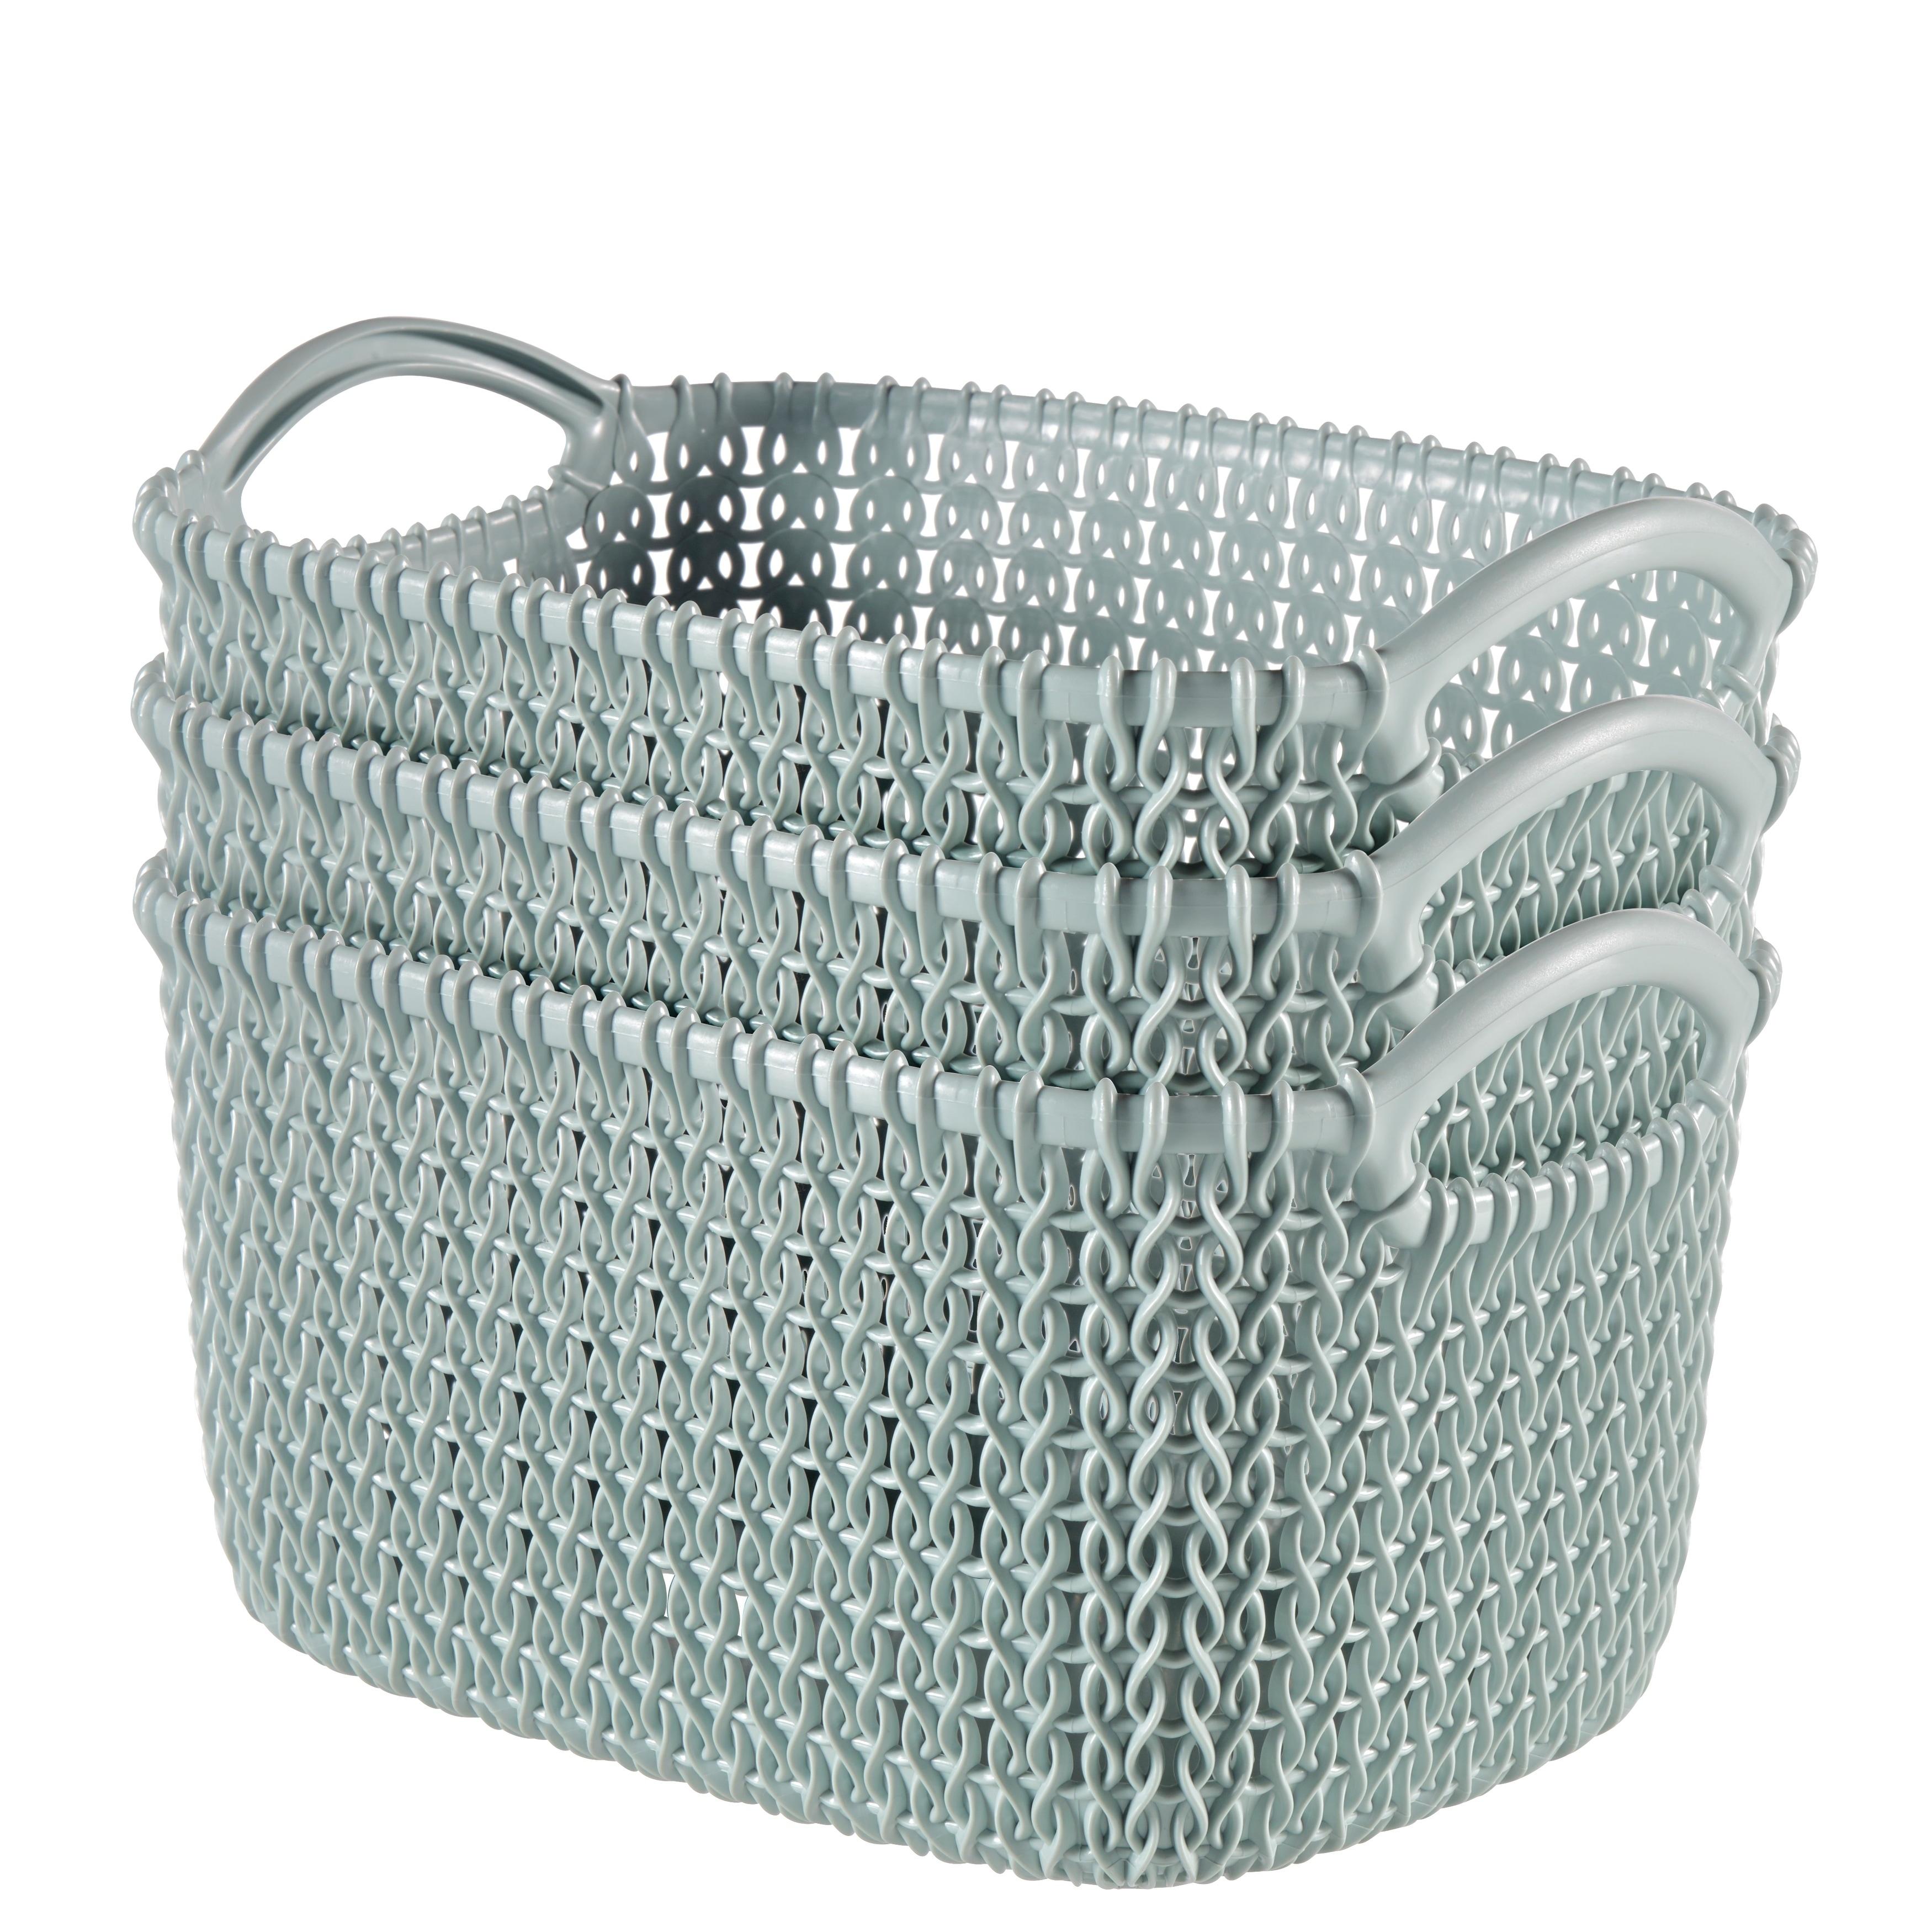 Buy Baskets & Bowls Online at Overstock.com | Our Best Decorative ...